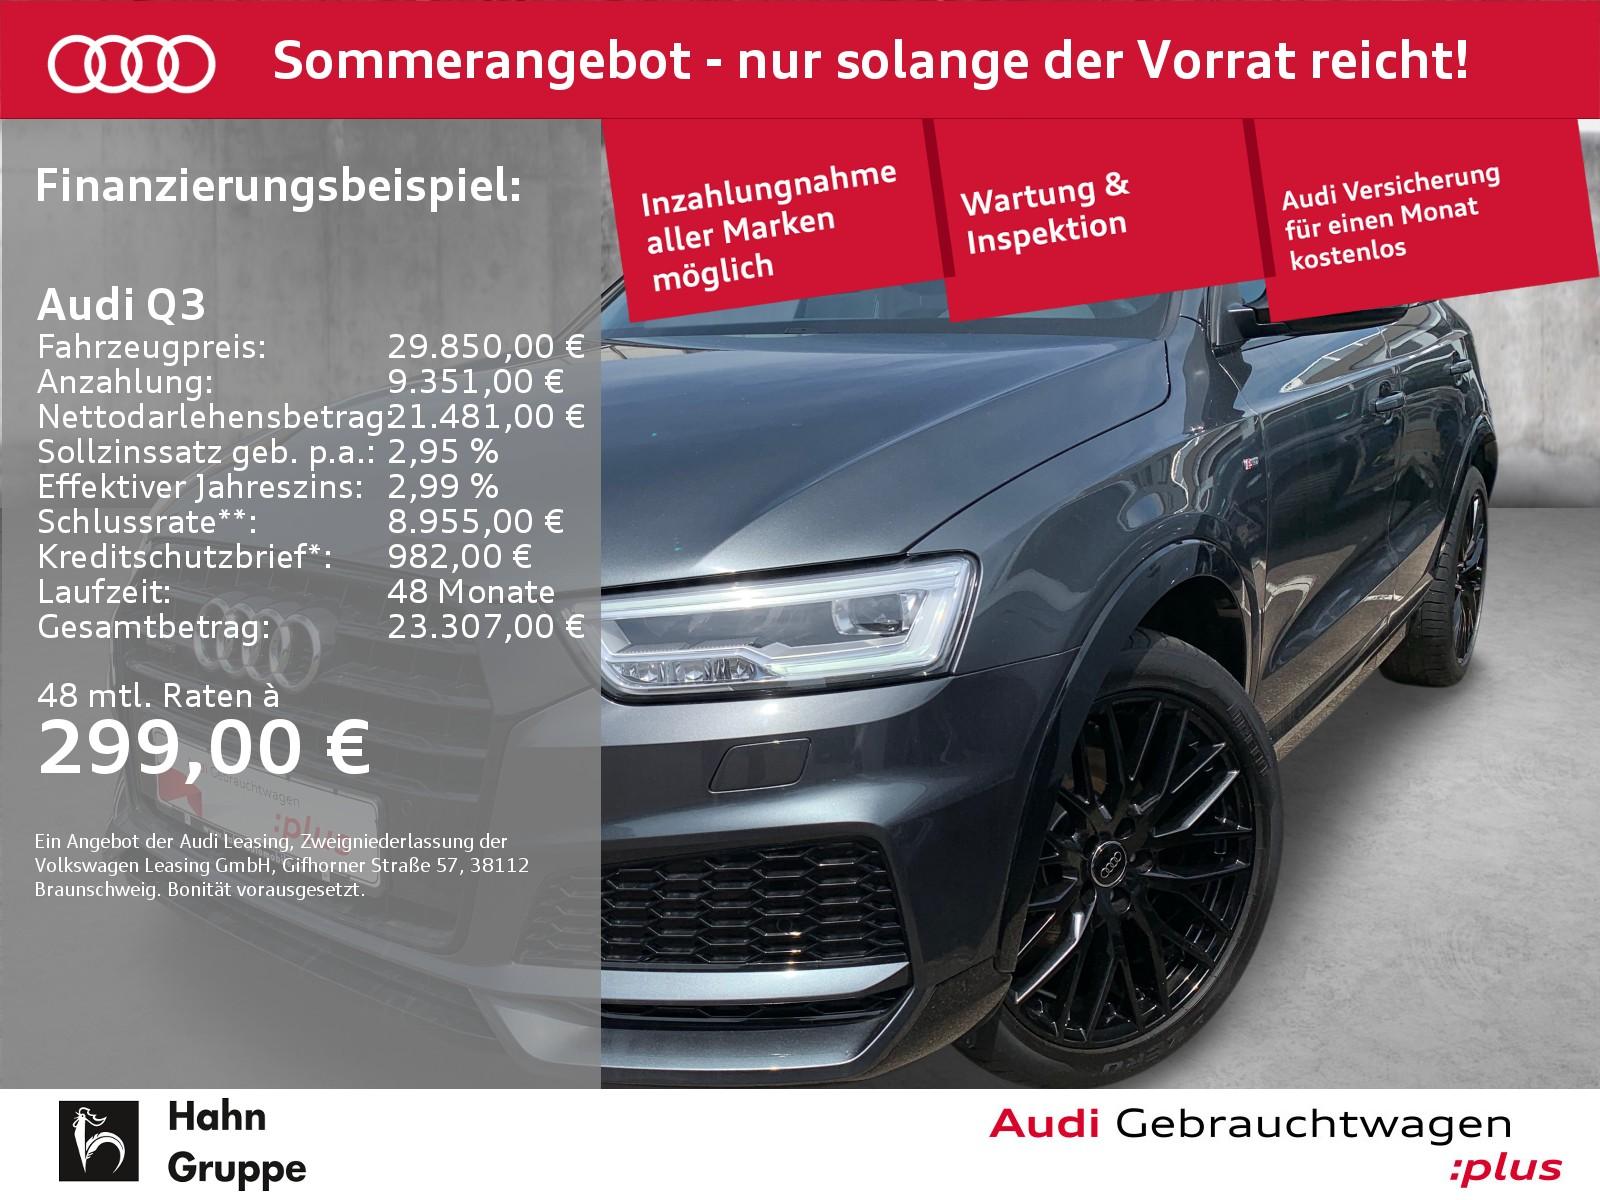 Audi Q3 2.0 TDI qua. S-trc S-line Navi LED Einpark, Jahr 2018, Diesel